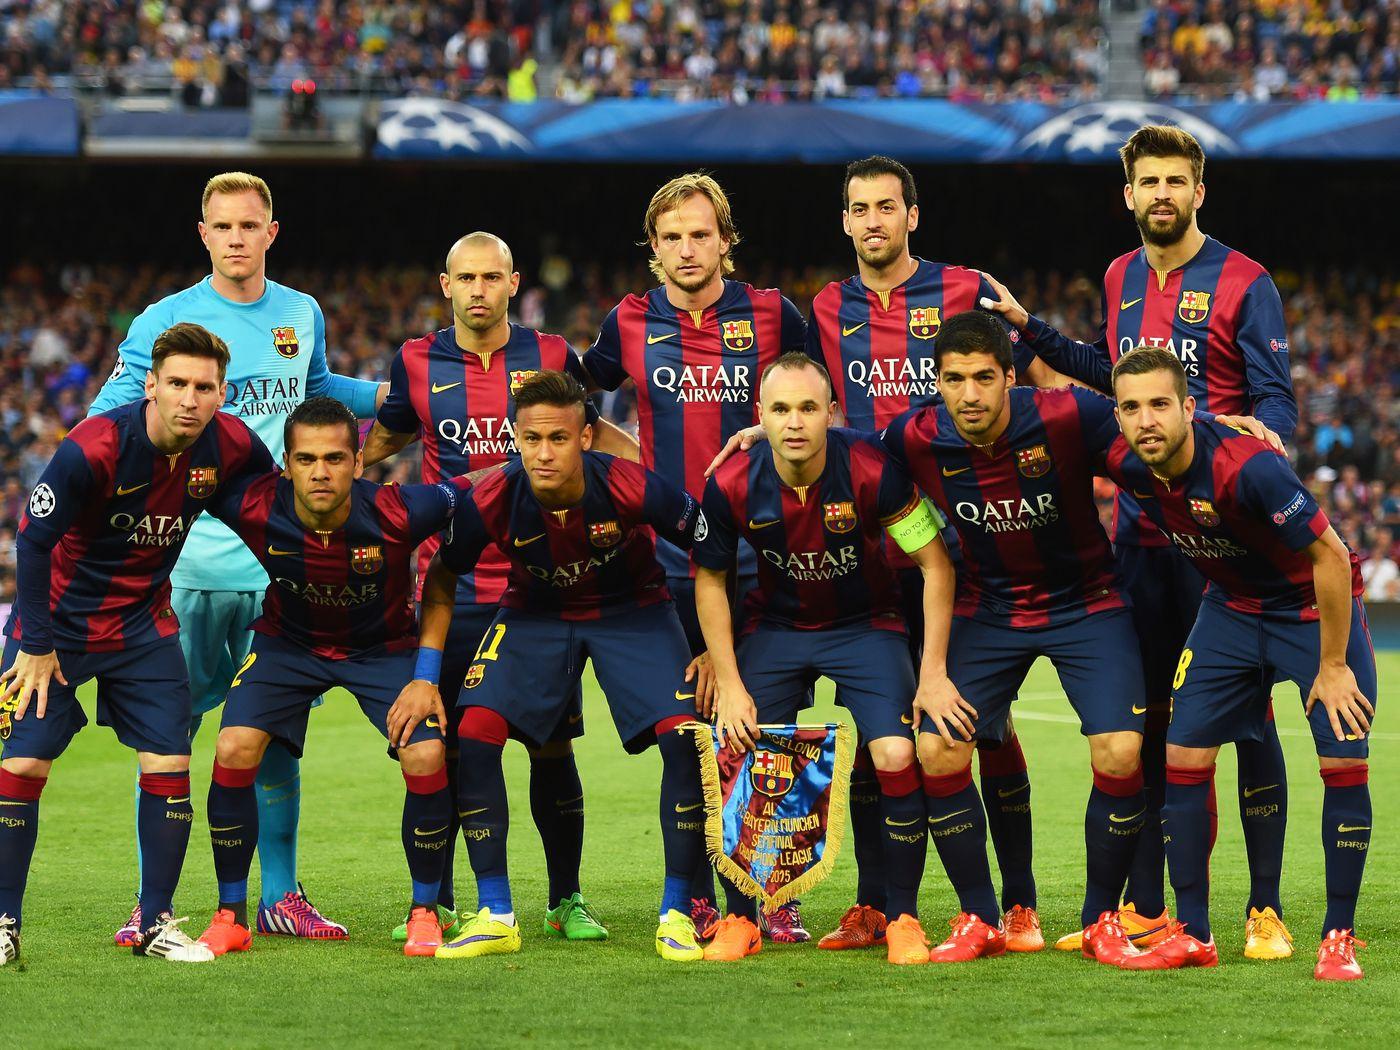 Bayern Munich Vs Barcelona Champions League Semifinal 2nd Leg Projected Lineups Barca Blaugranes